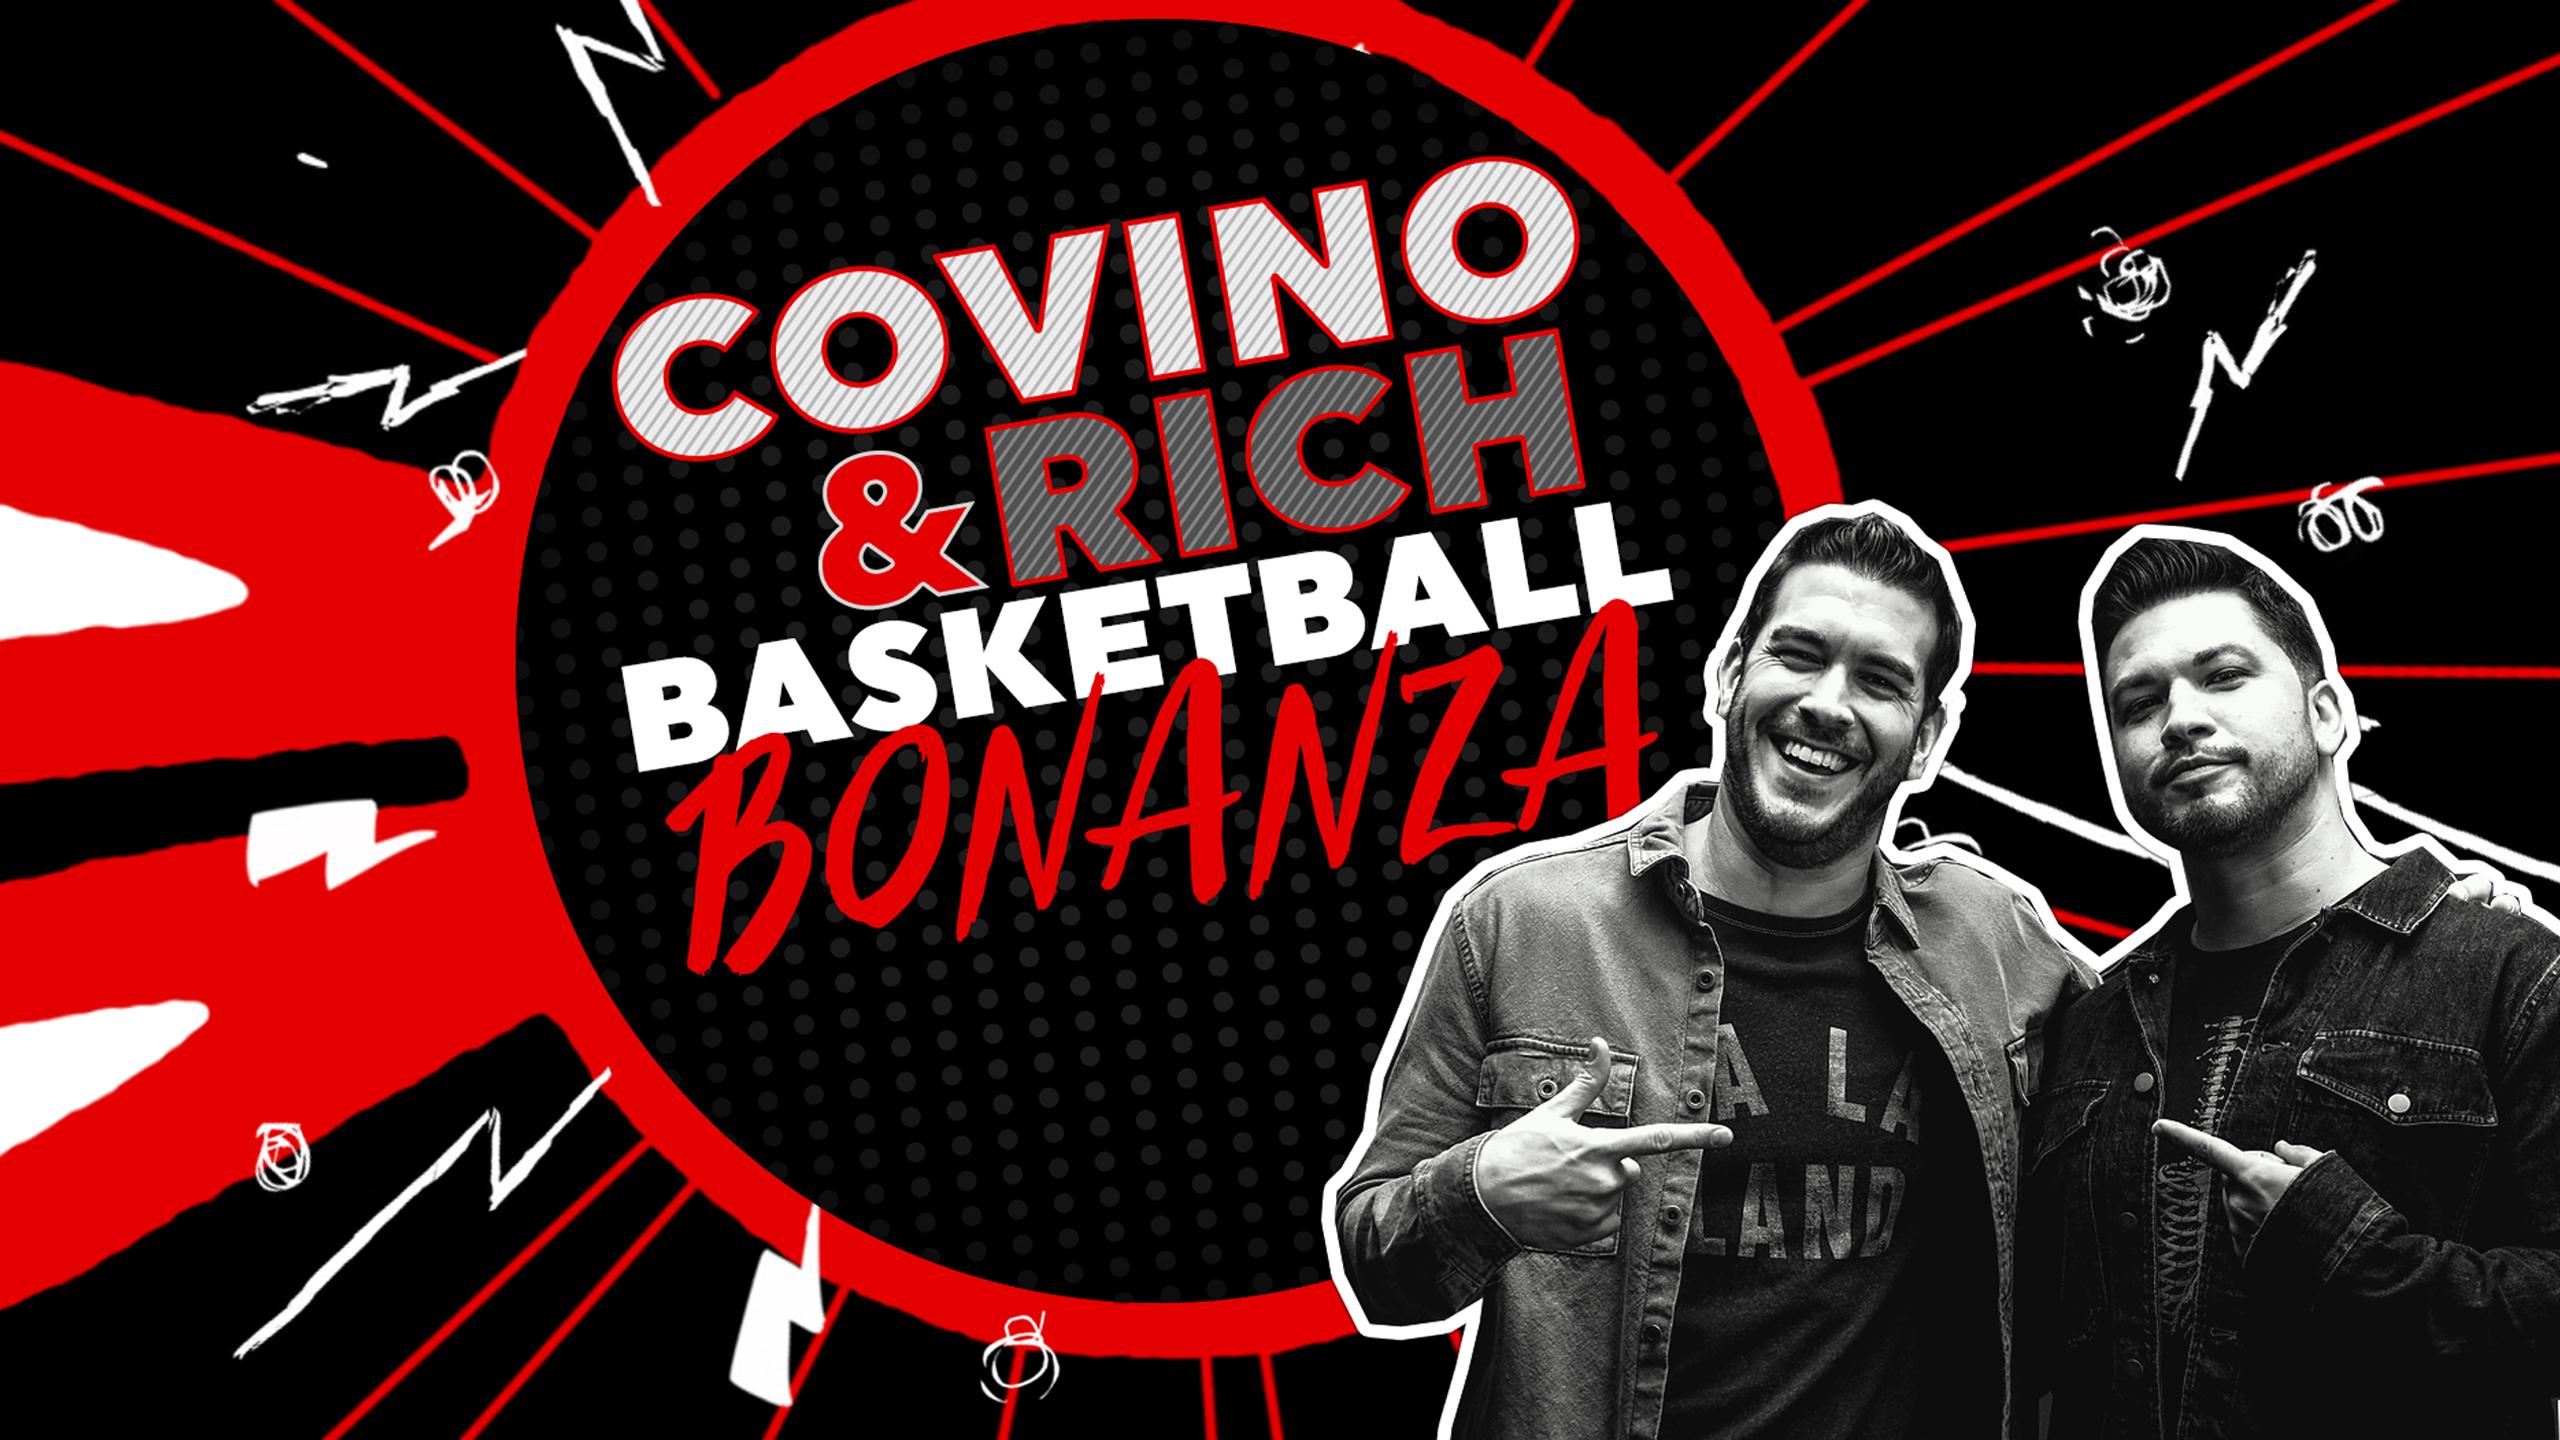 Covino & Rich's Basketball Bonanza (Marathon)